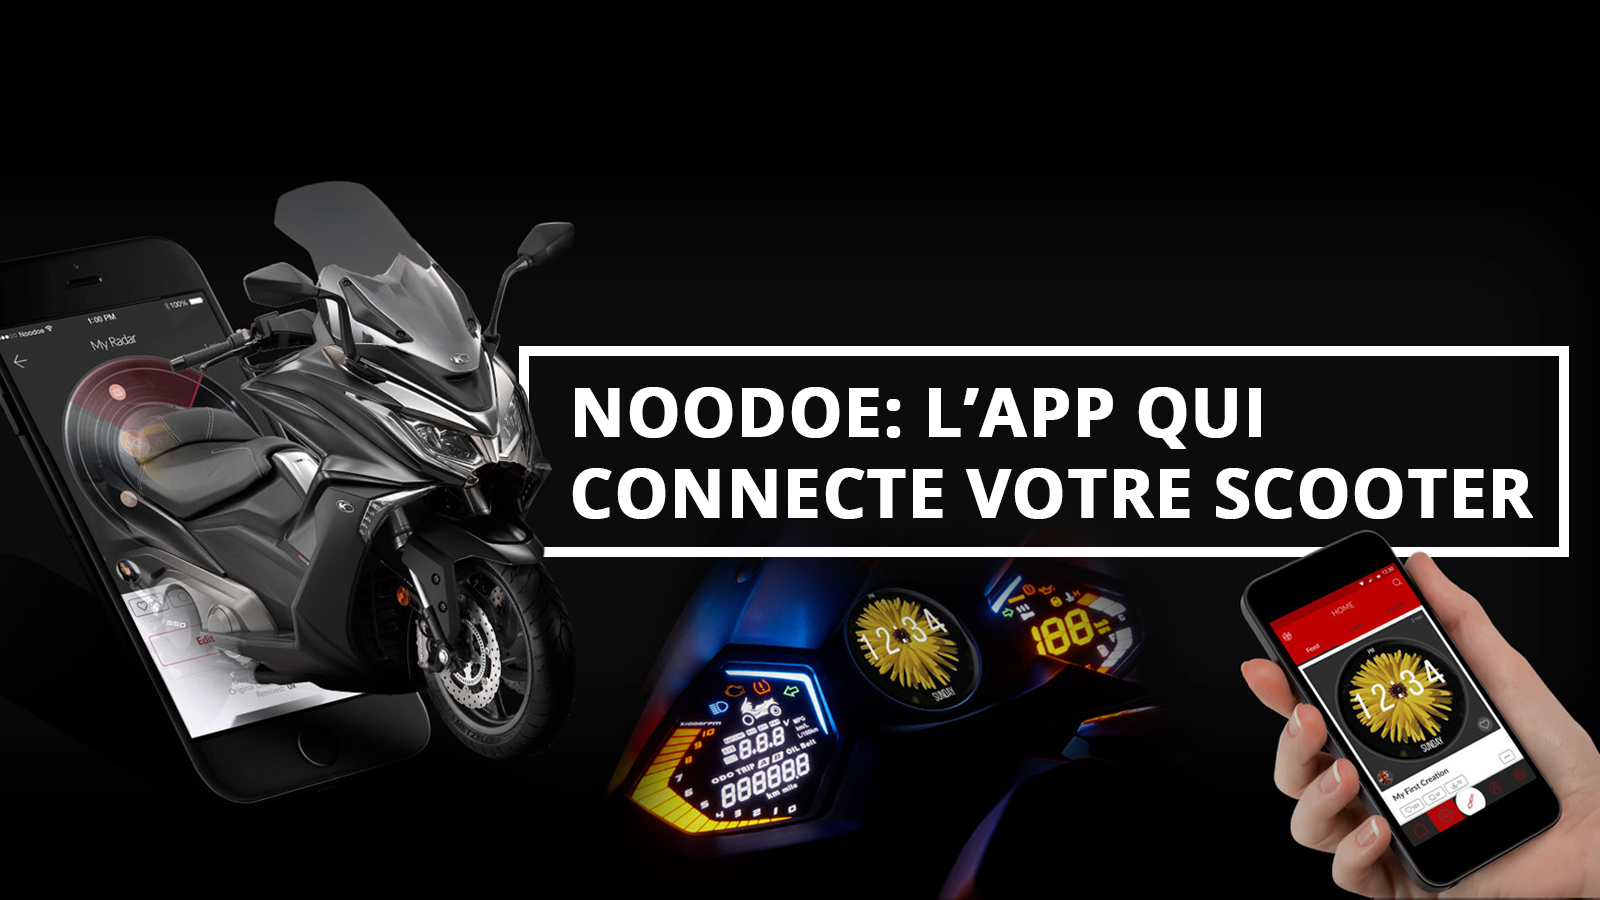 noodoe-app-connecte-scooter-featured